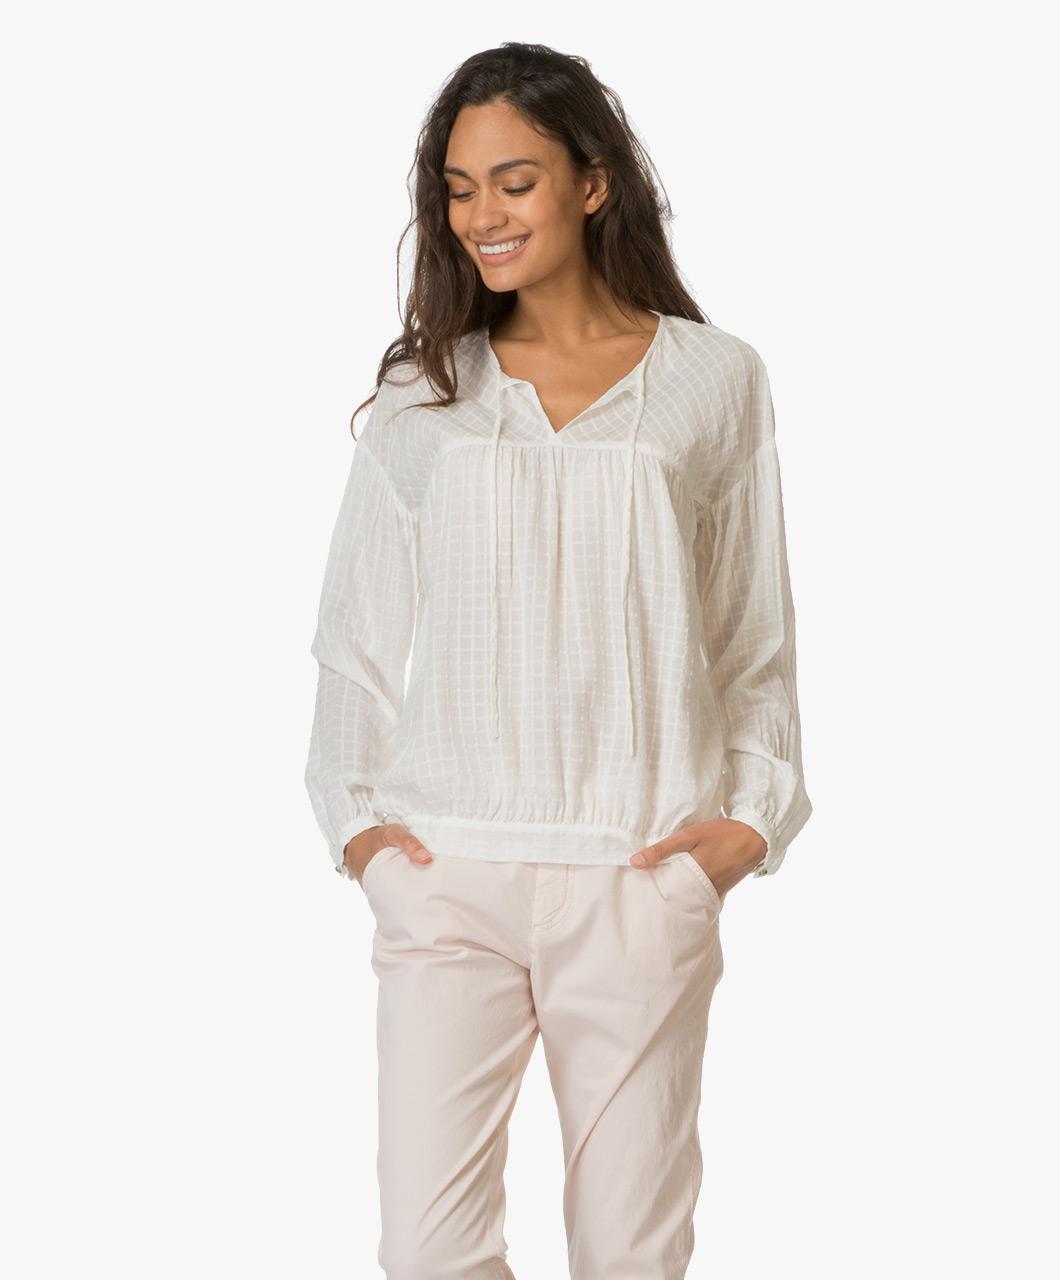 boss orange exotic blouse off white exotic 50330132 100. Black Bedroom Furniture Sets. Home Design Ideas